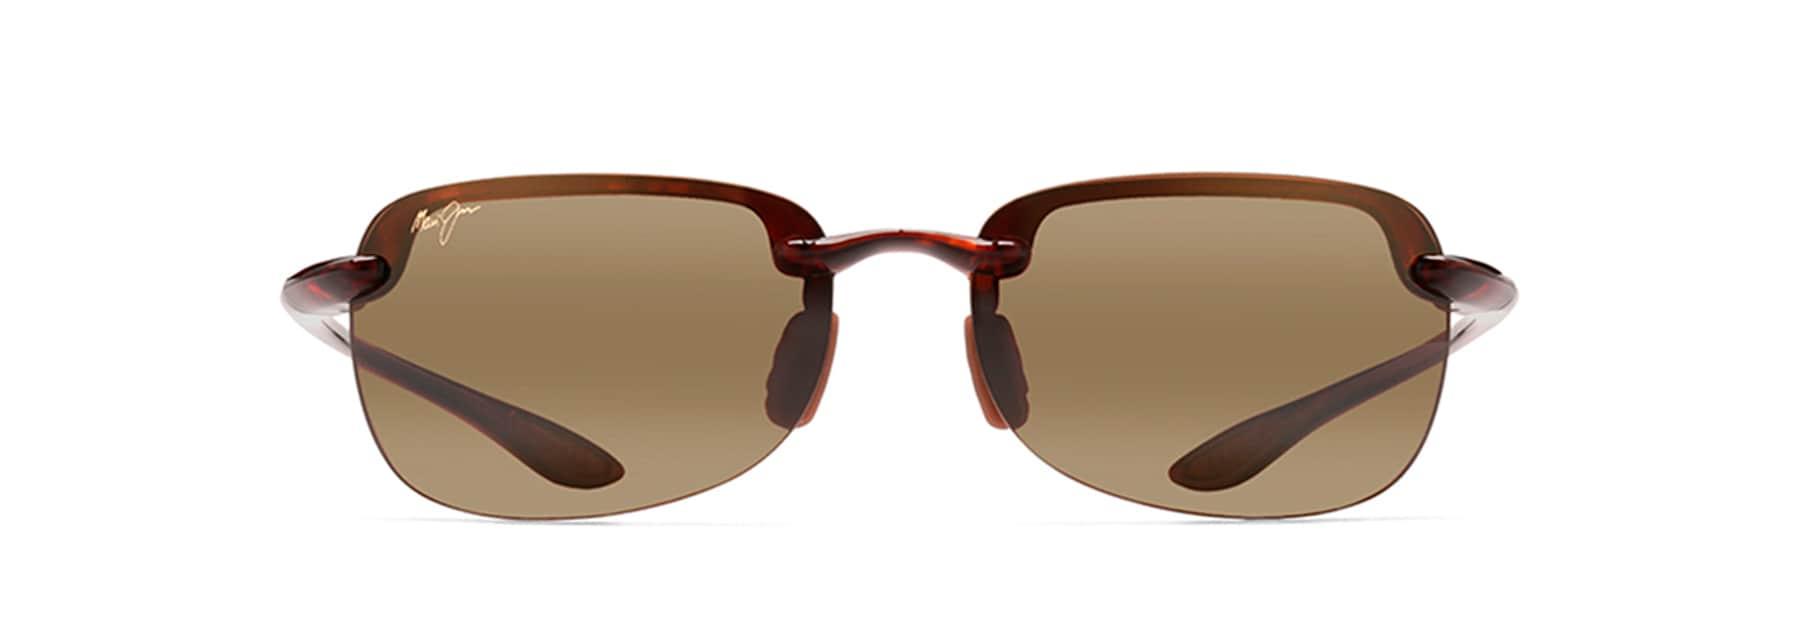 386f8c3178ef5 Sandy Beach Polarised Sunglasses